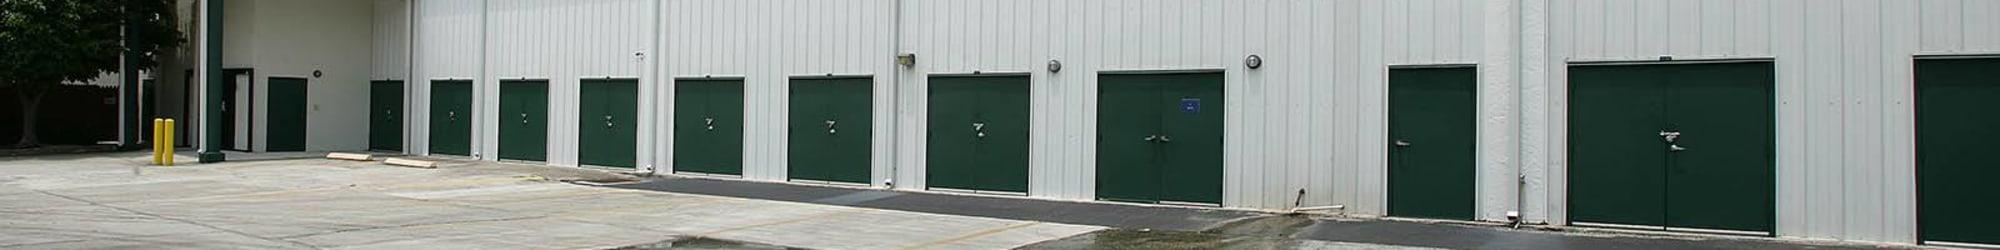 Self Storage Sarasota Fl Storage Unit Sizes Prices